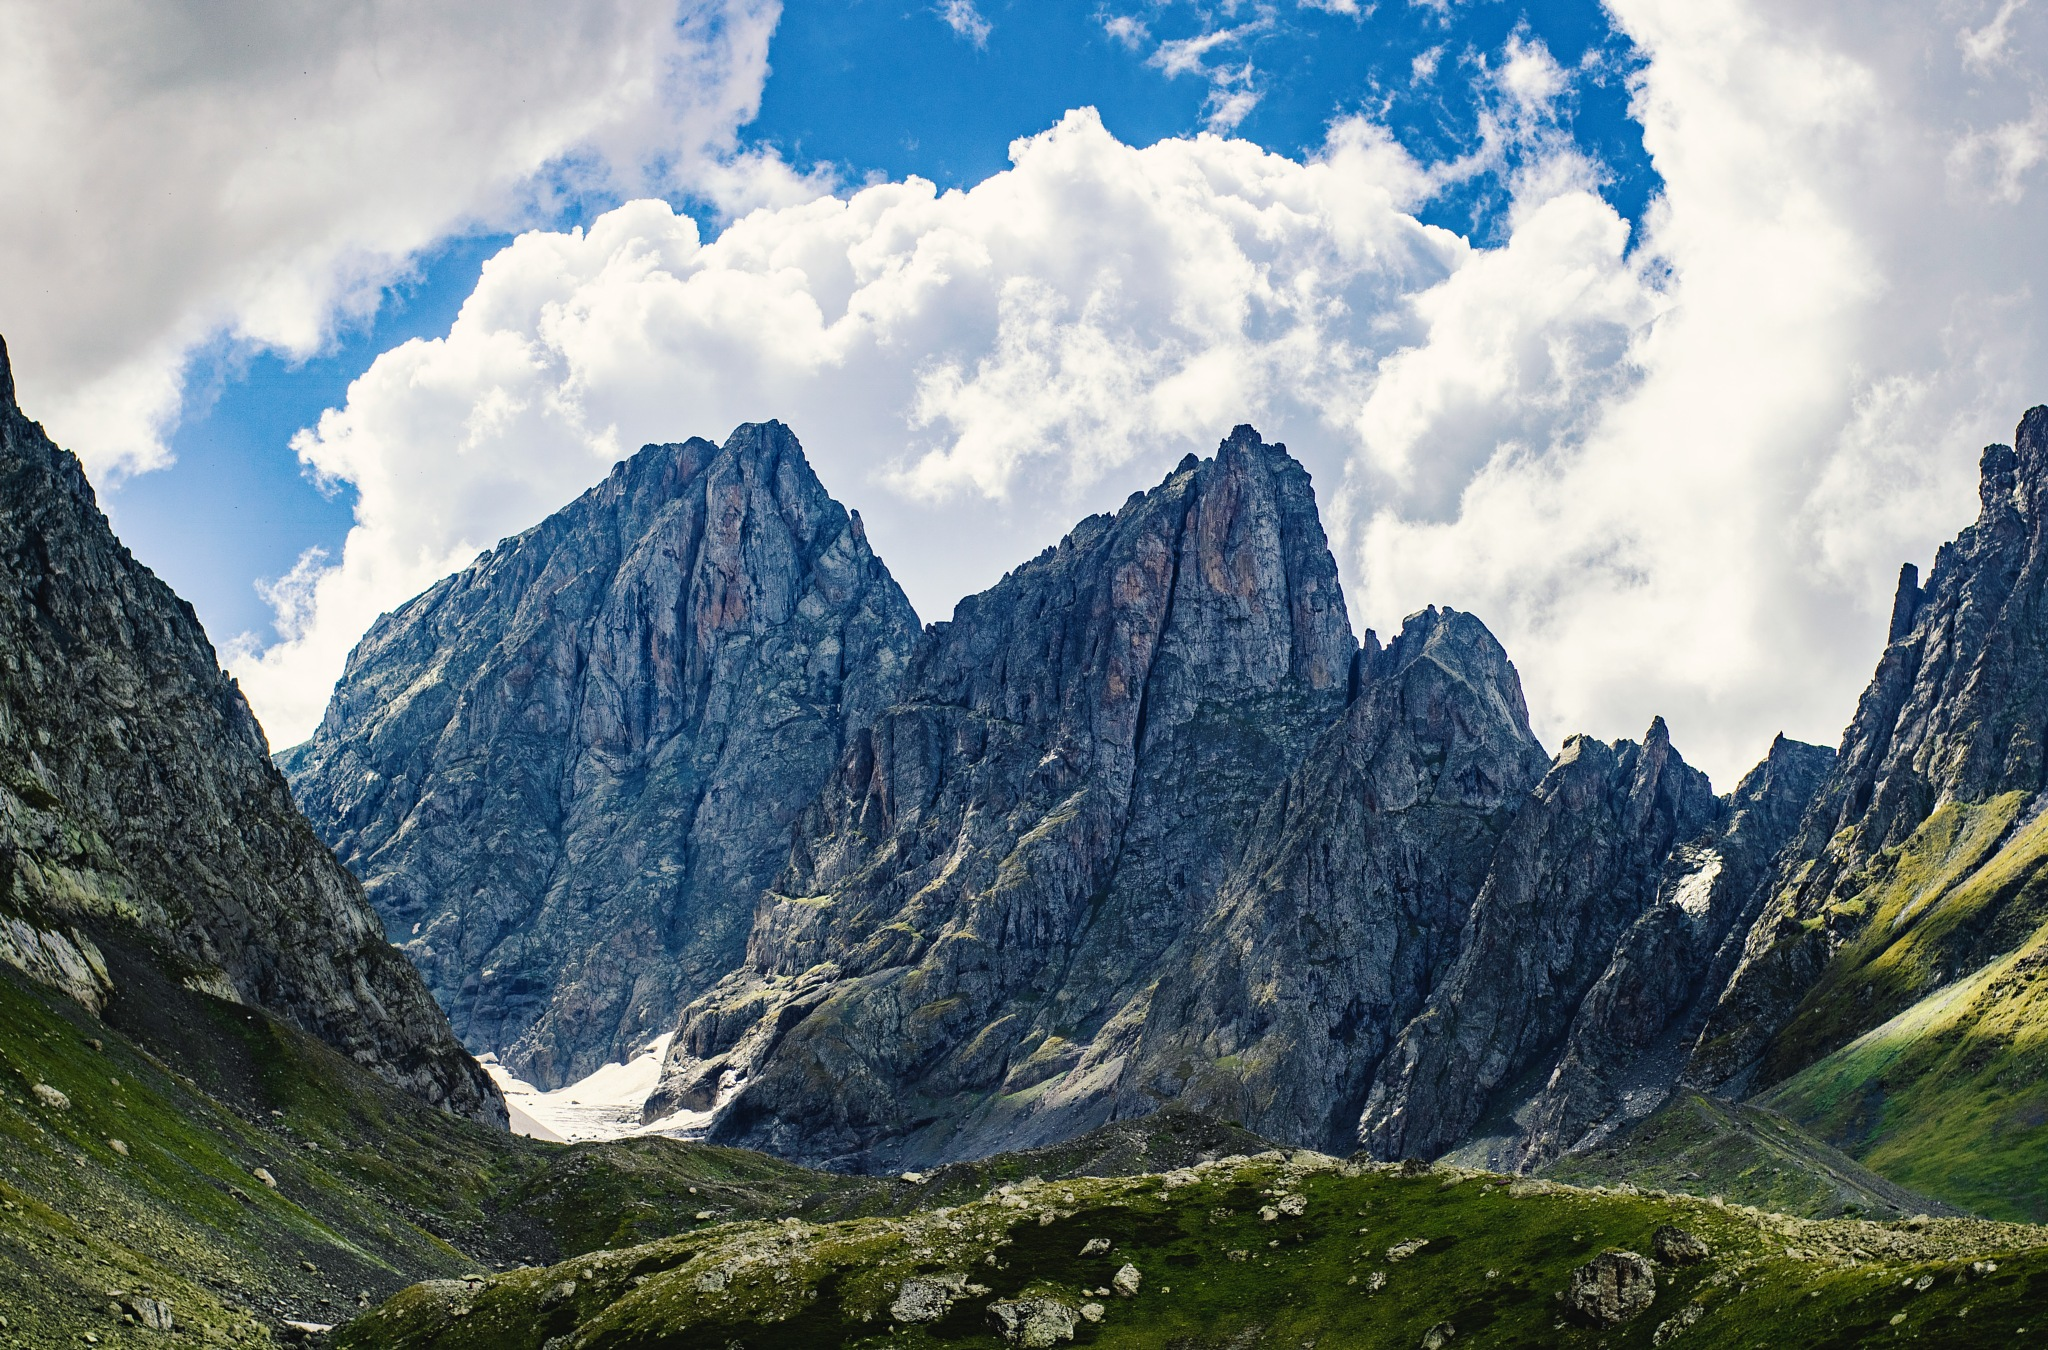 HDR Panorama by Giorgi Gvritishvili